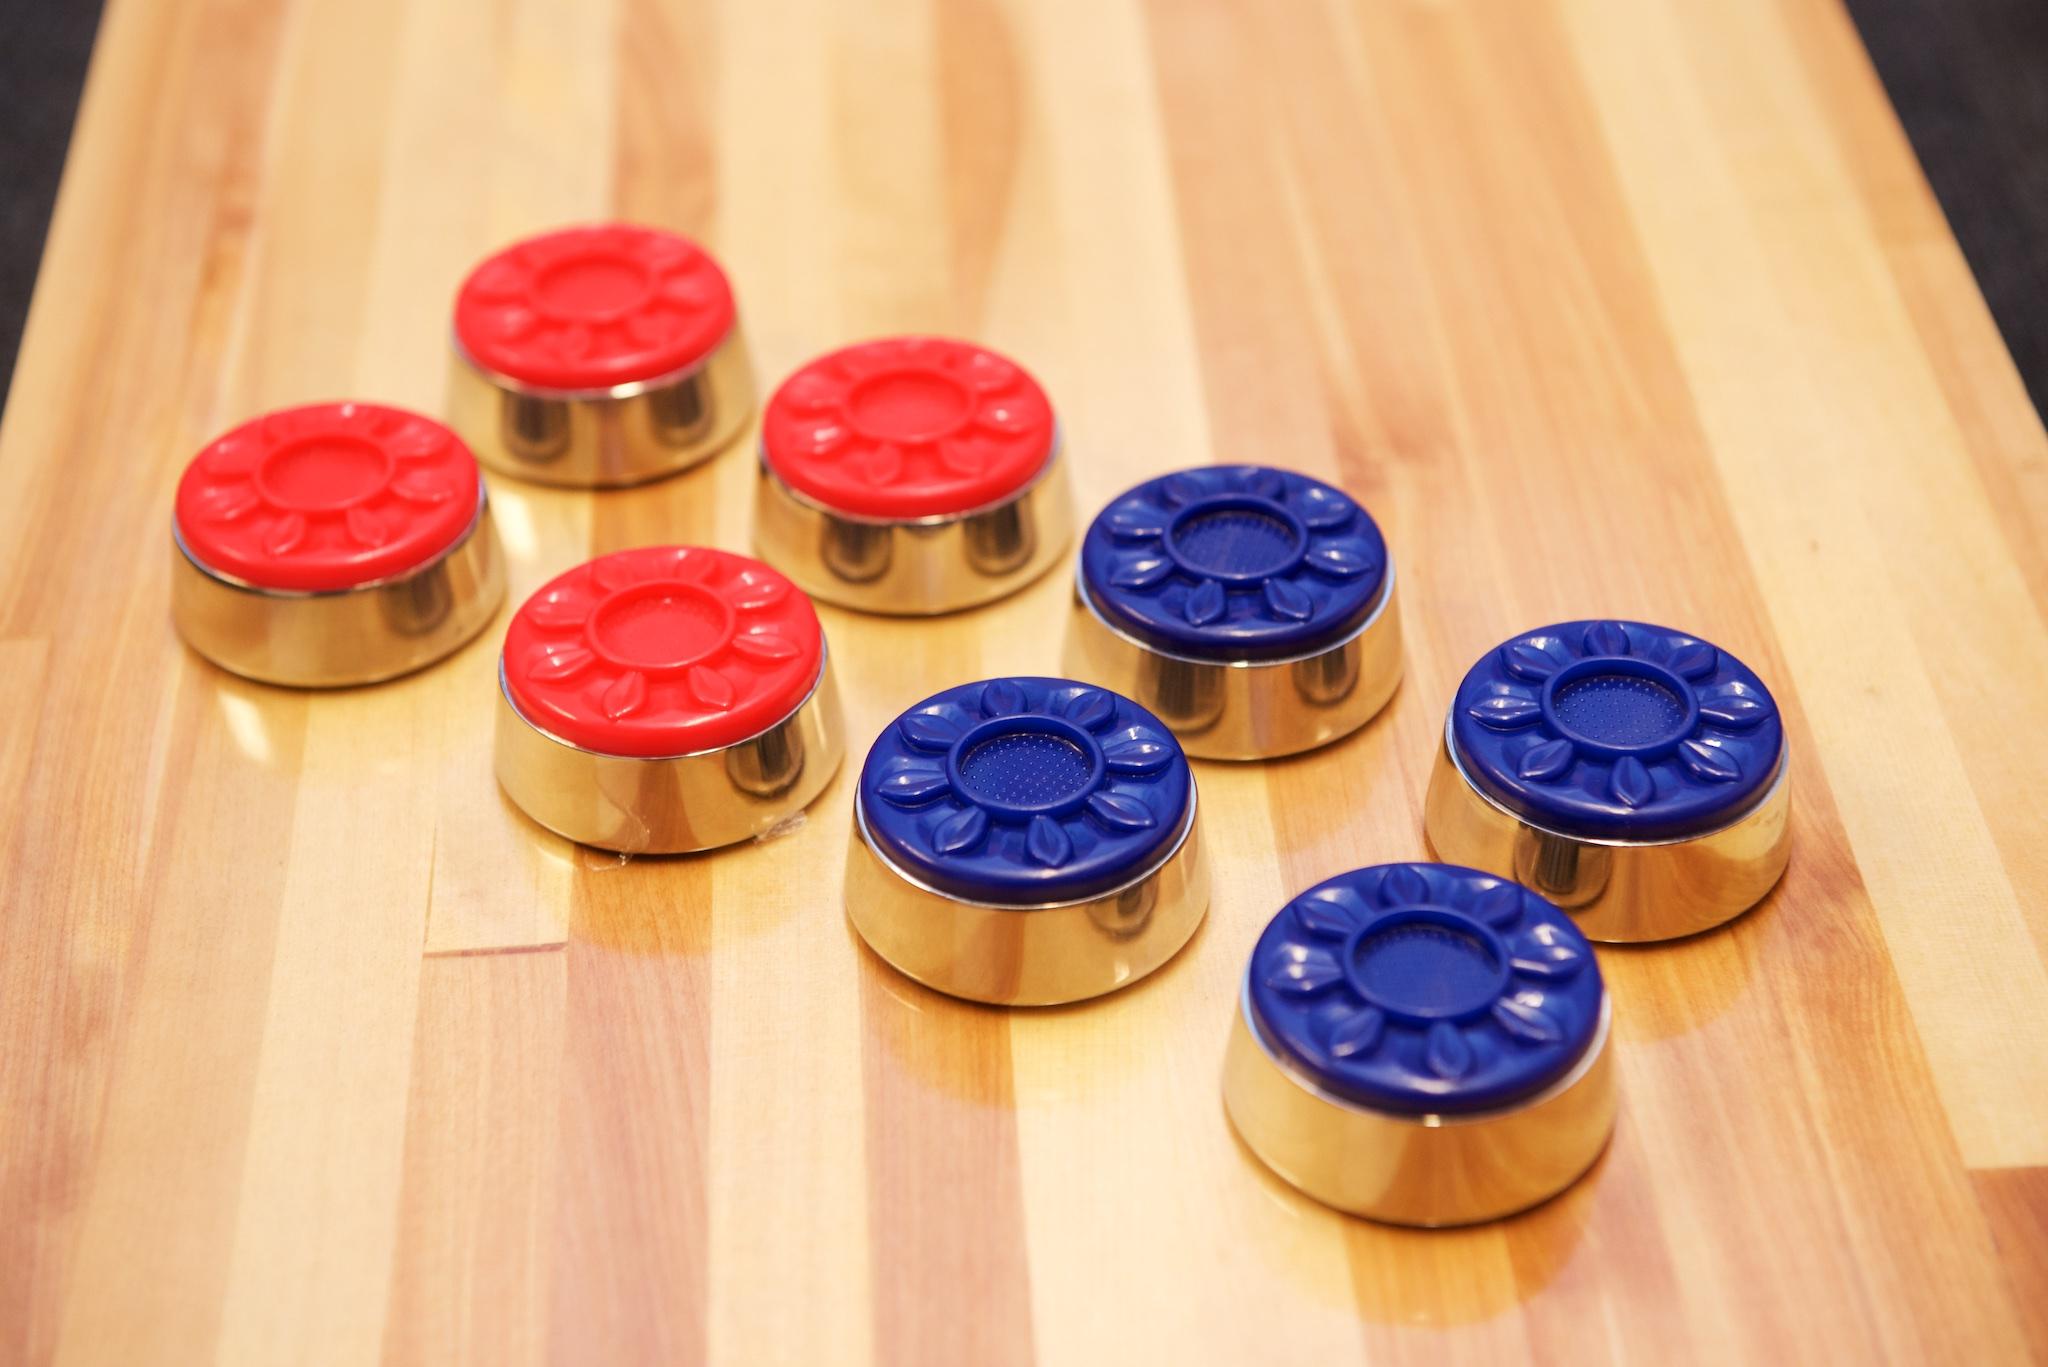 Shuffleboard steiner små 53 mm 280 gram